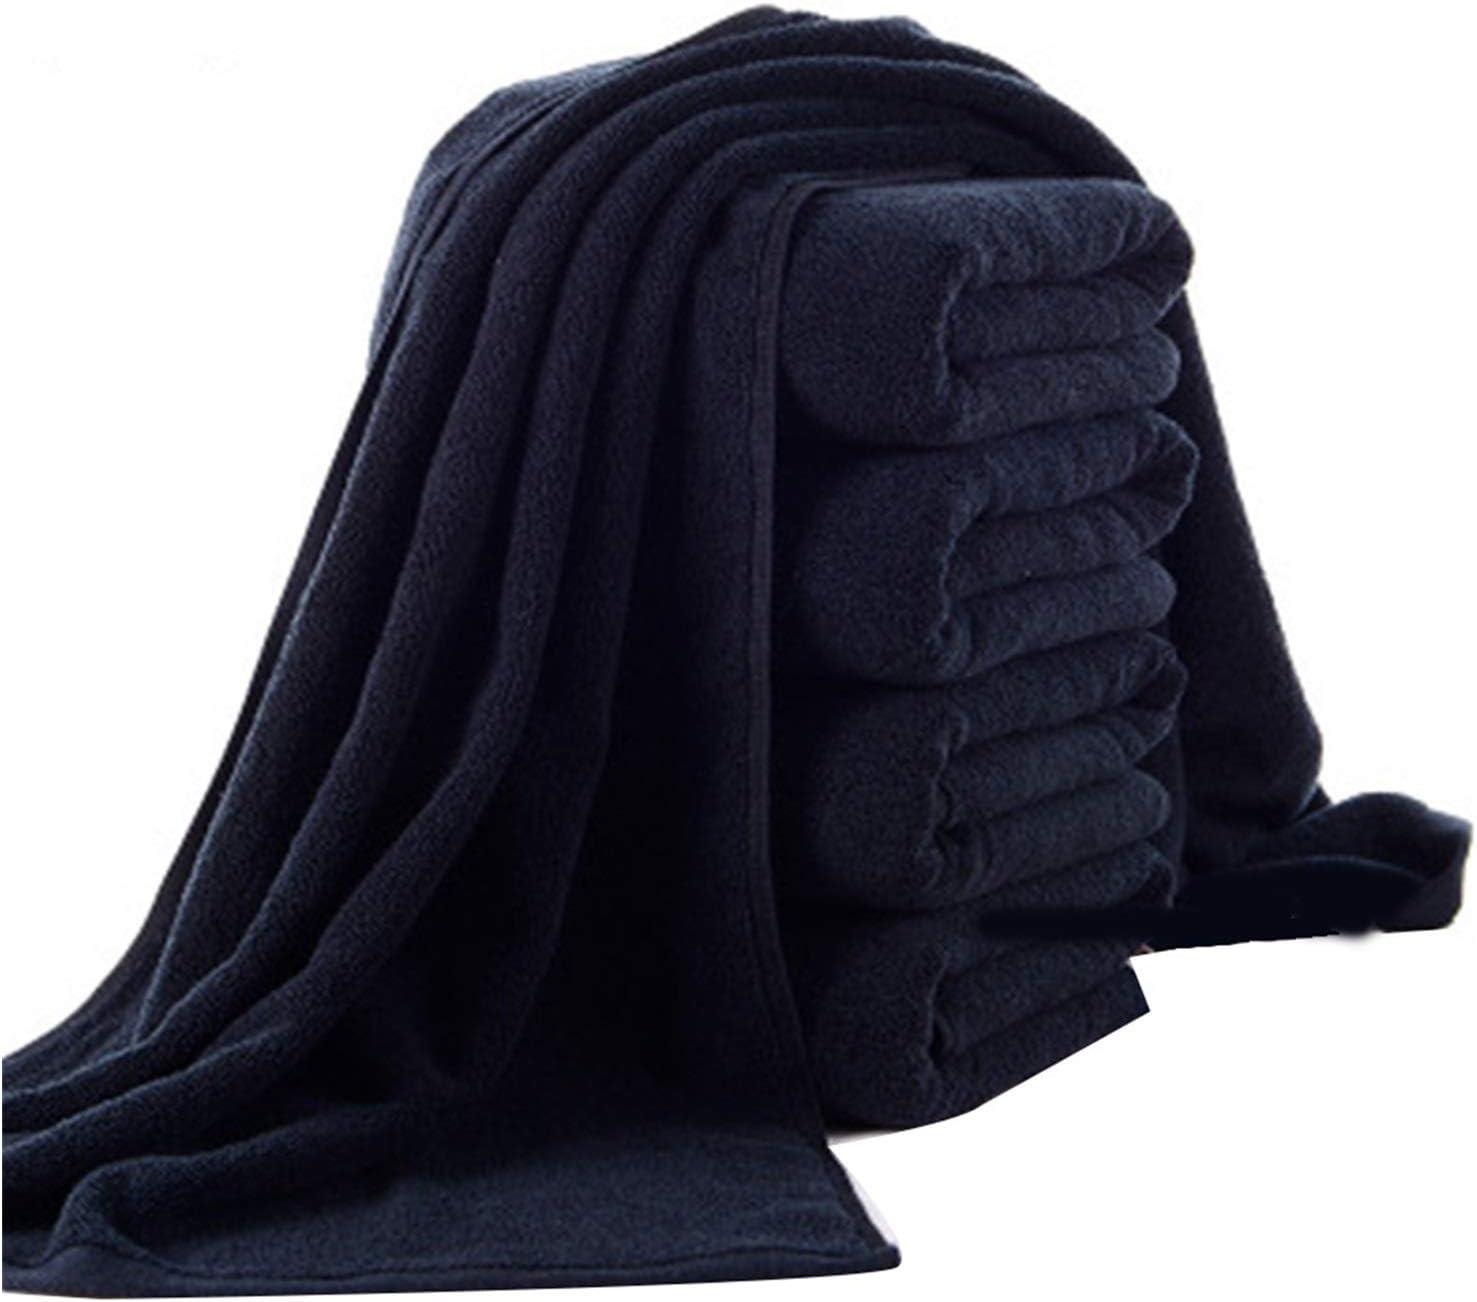 Jgzwlkj Bathroom Towels 70x140 cm Black Bath Towel Cotton Pure trust S Max 68% OFF